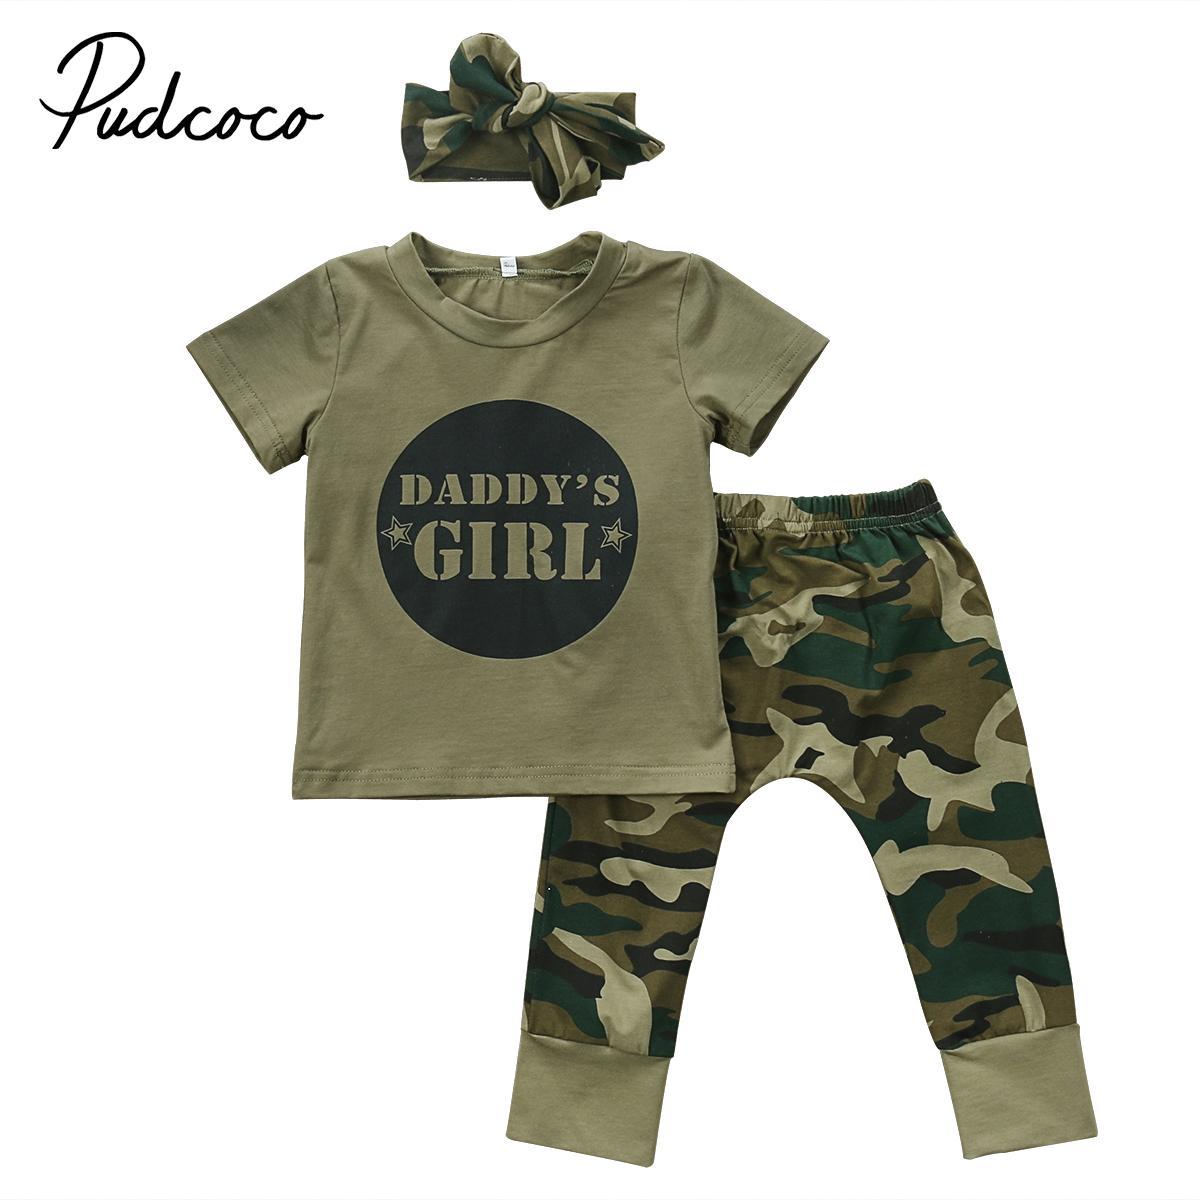 ccc7ca217f9d 2019 Summer Newborn Baby Boy Girls Camouflage T Shirt Tops+Pants ...